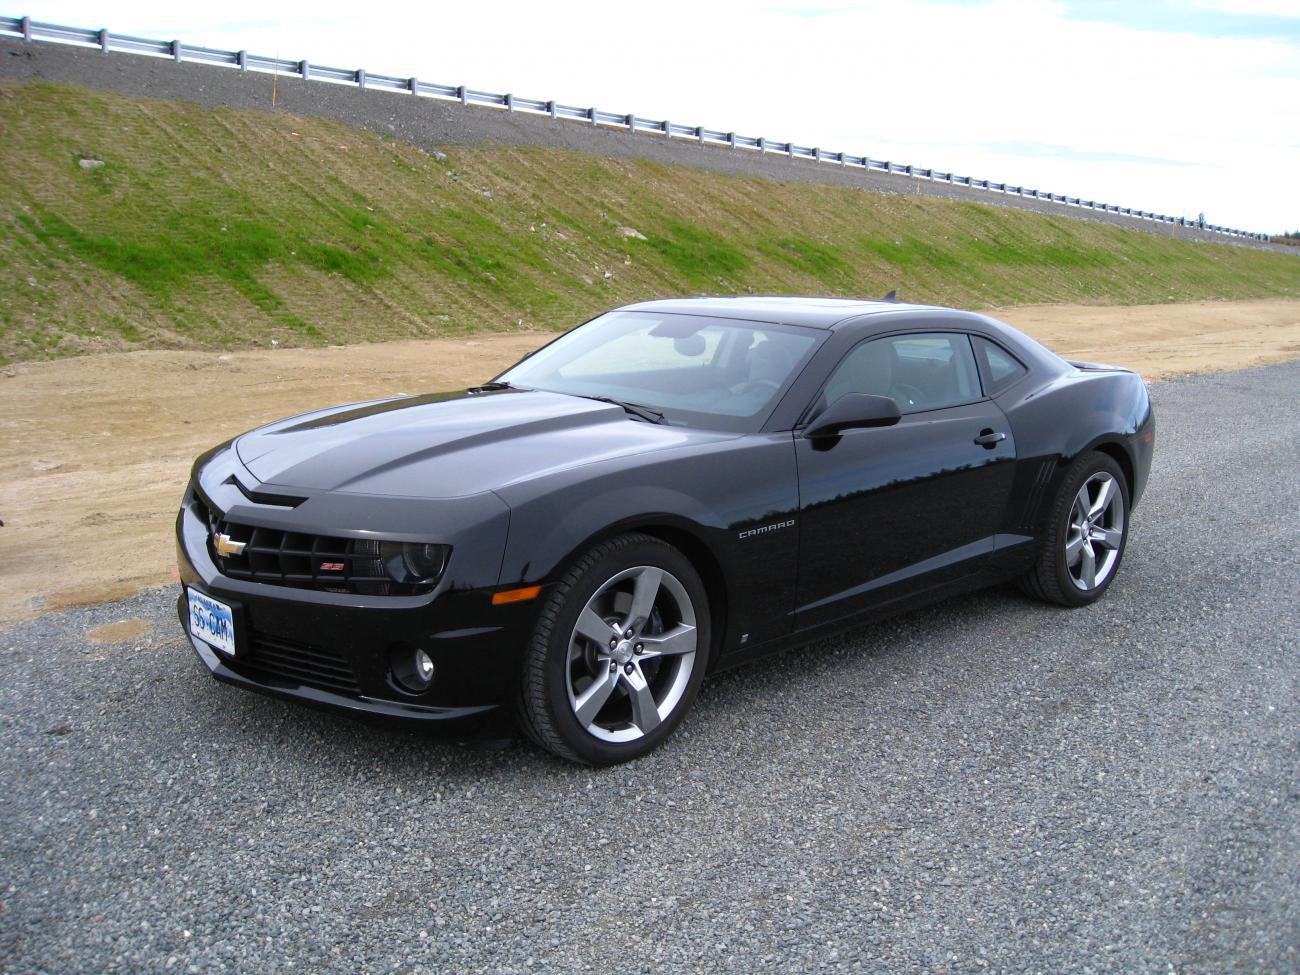 2010 2ss rs auto trans black camaro5 chevy camaro. Black Bedroom Furniture Sets. Home Design Ideas